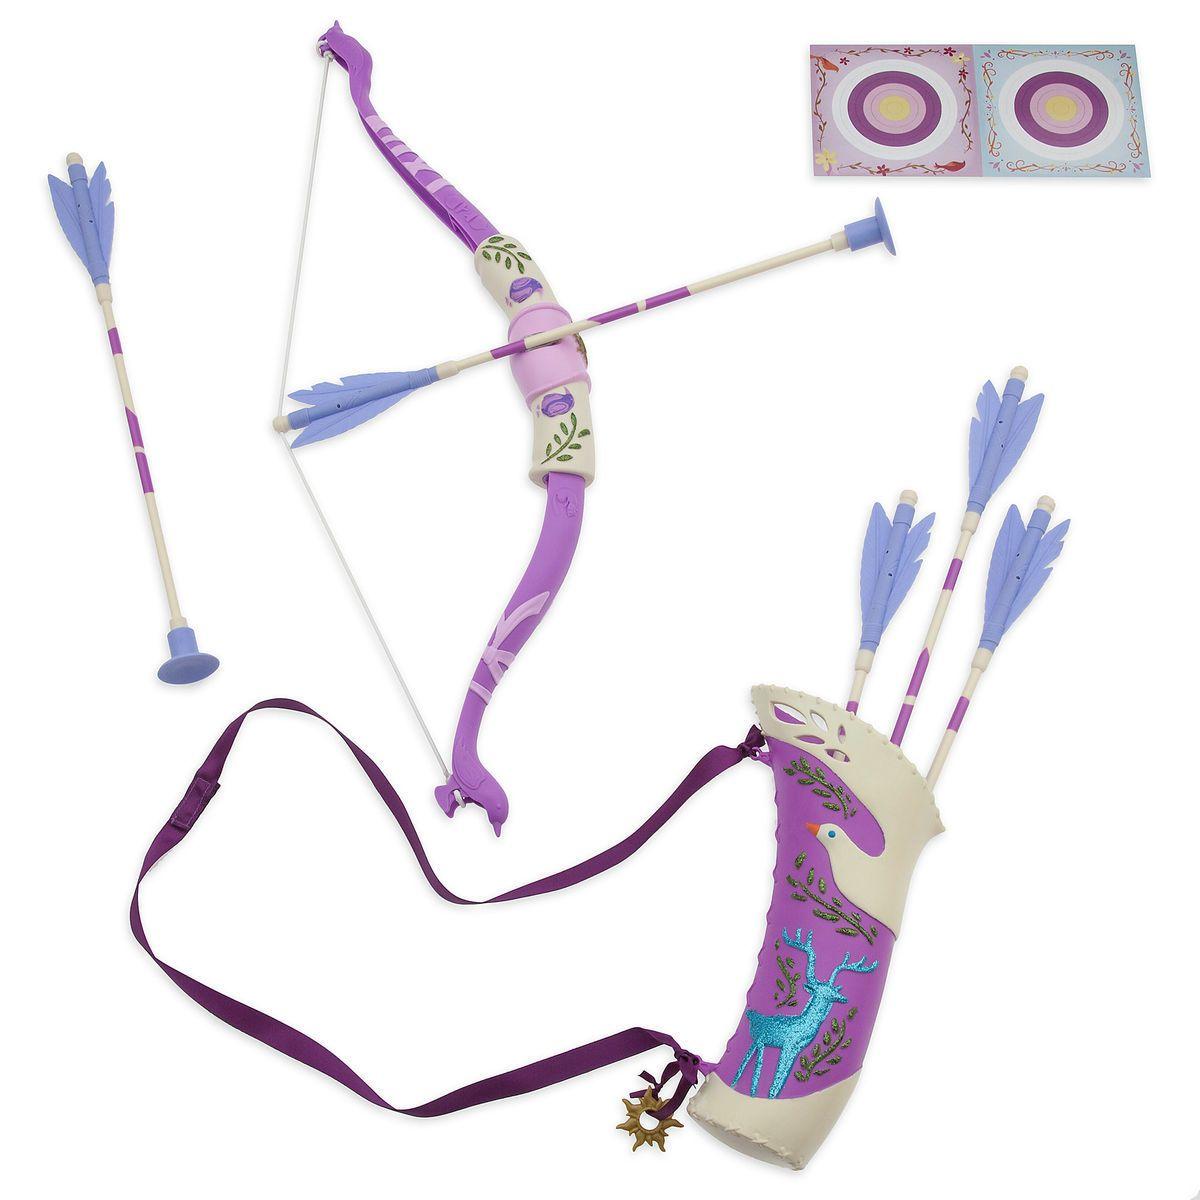 Disney Tangled Rapunzel Bow and Arrow Set